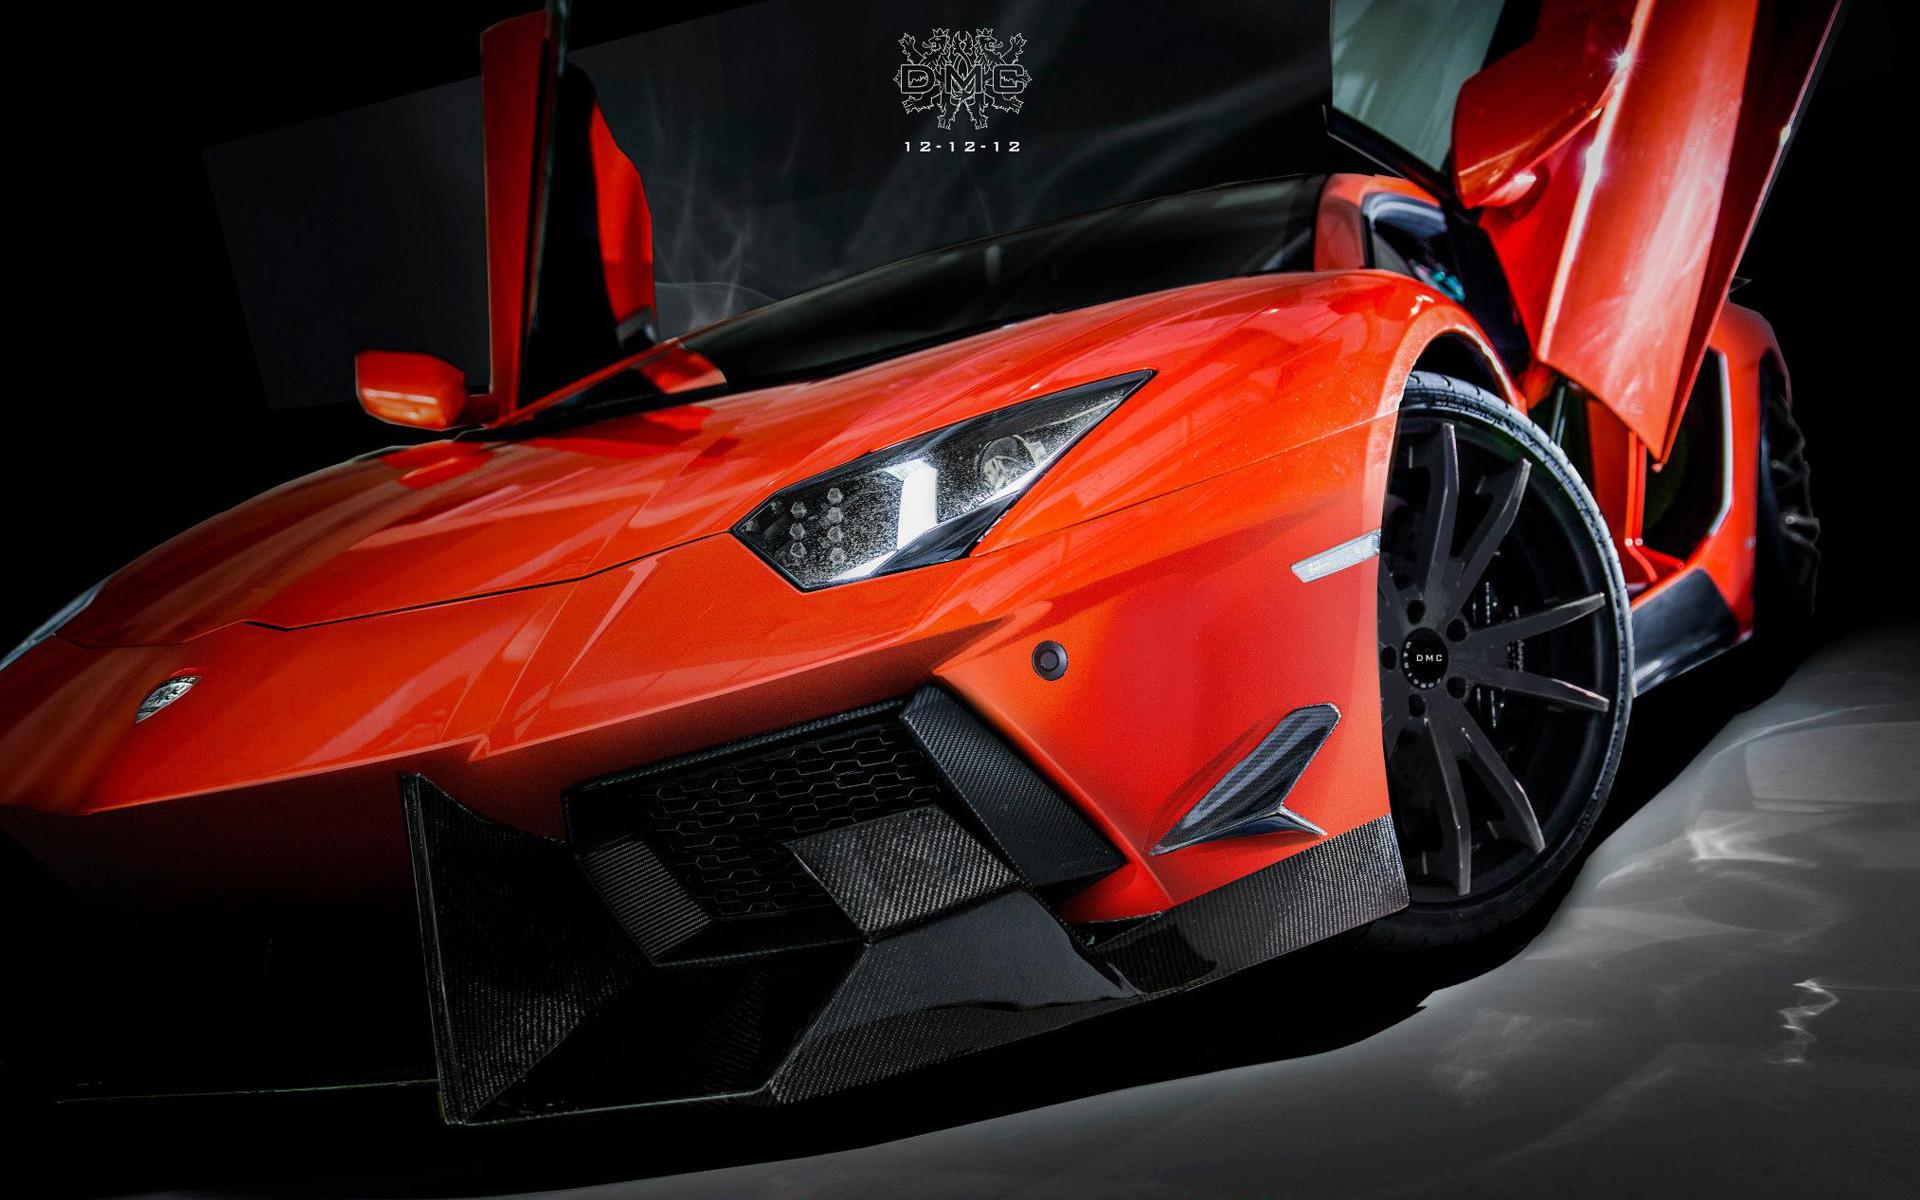 Lamborghini Aventador Full Hd Fond D 233 Cran And Arri 232 Re